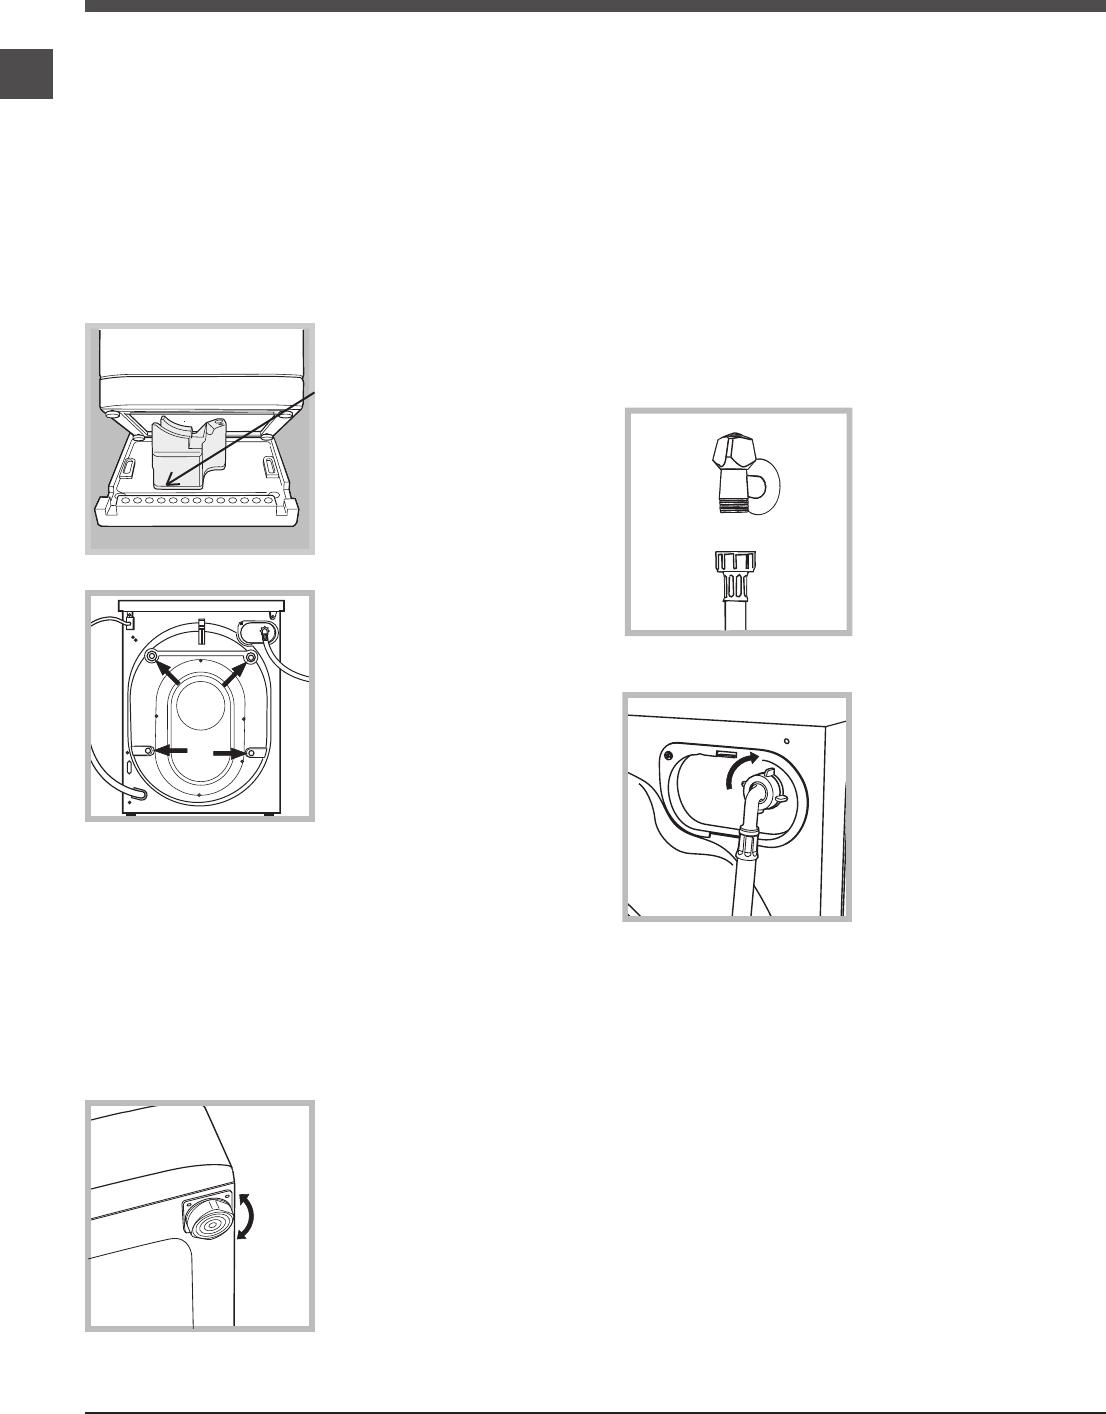 Hotpoint Washing Machine Wmaqf 721 Users Manual